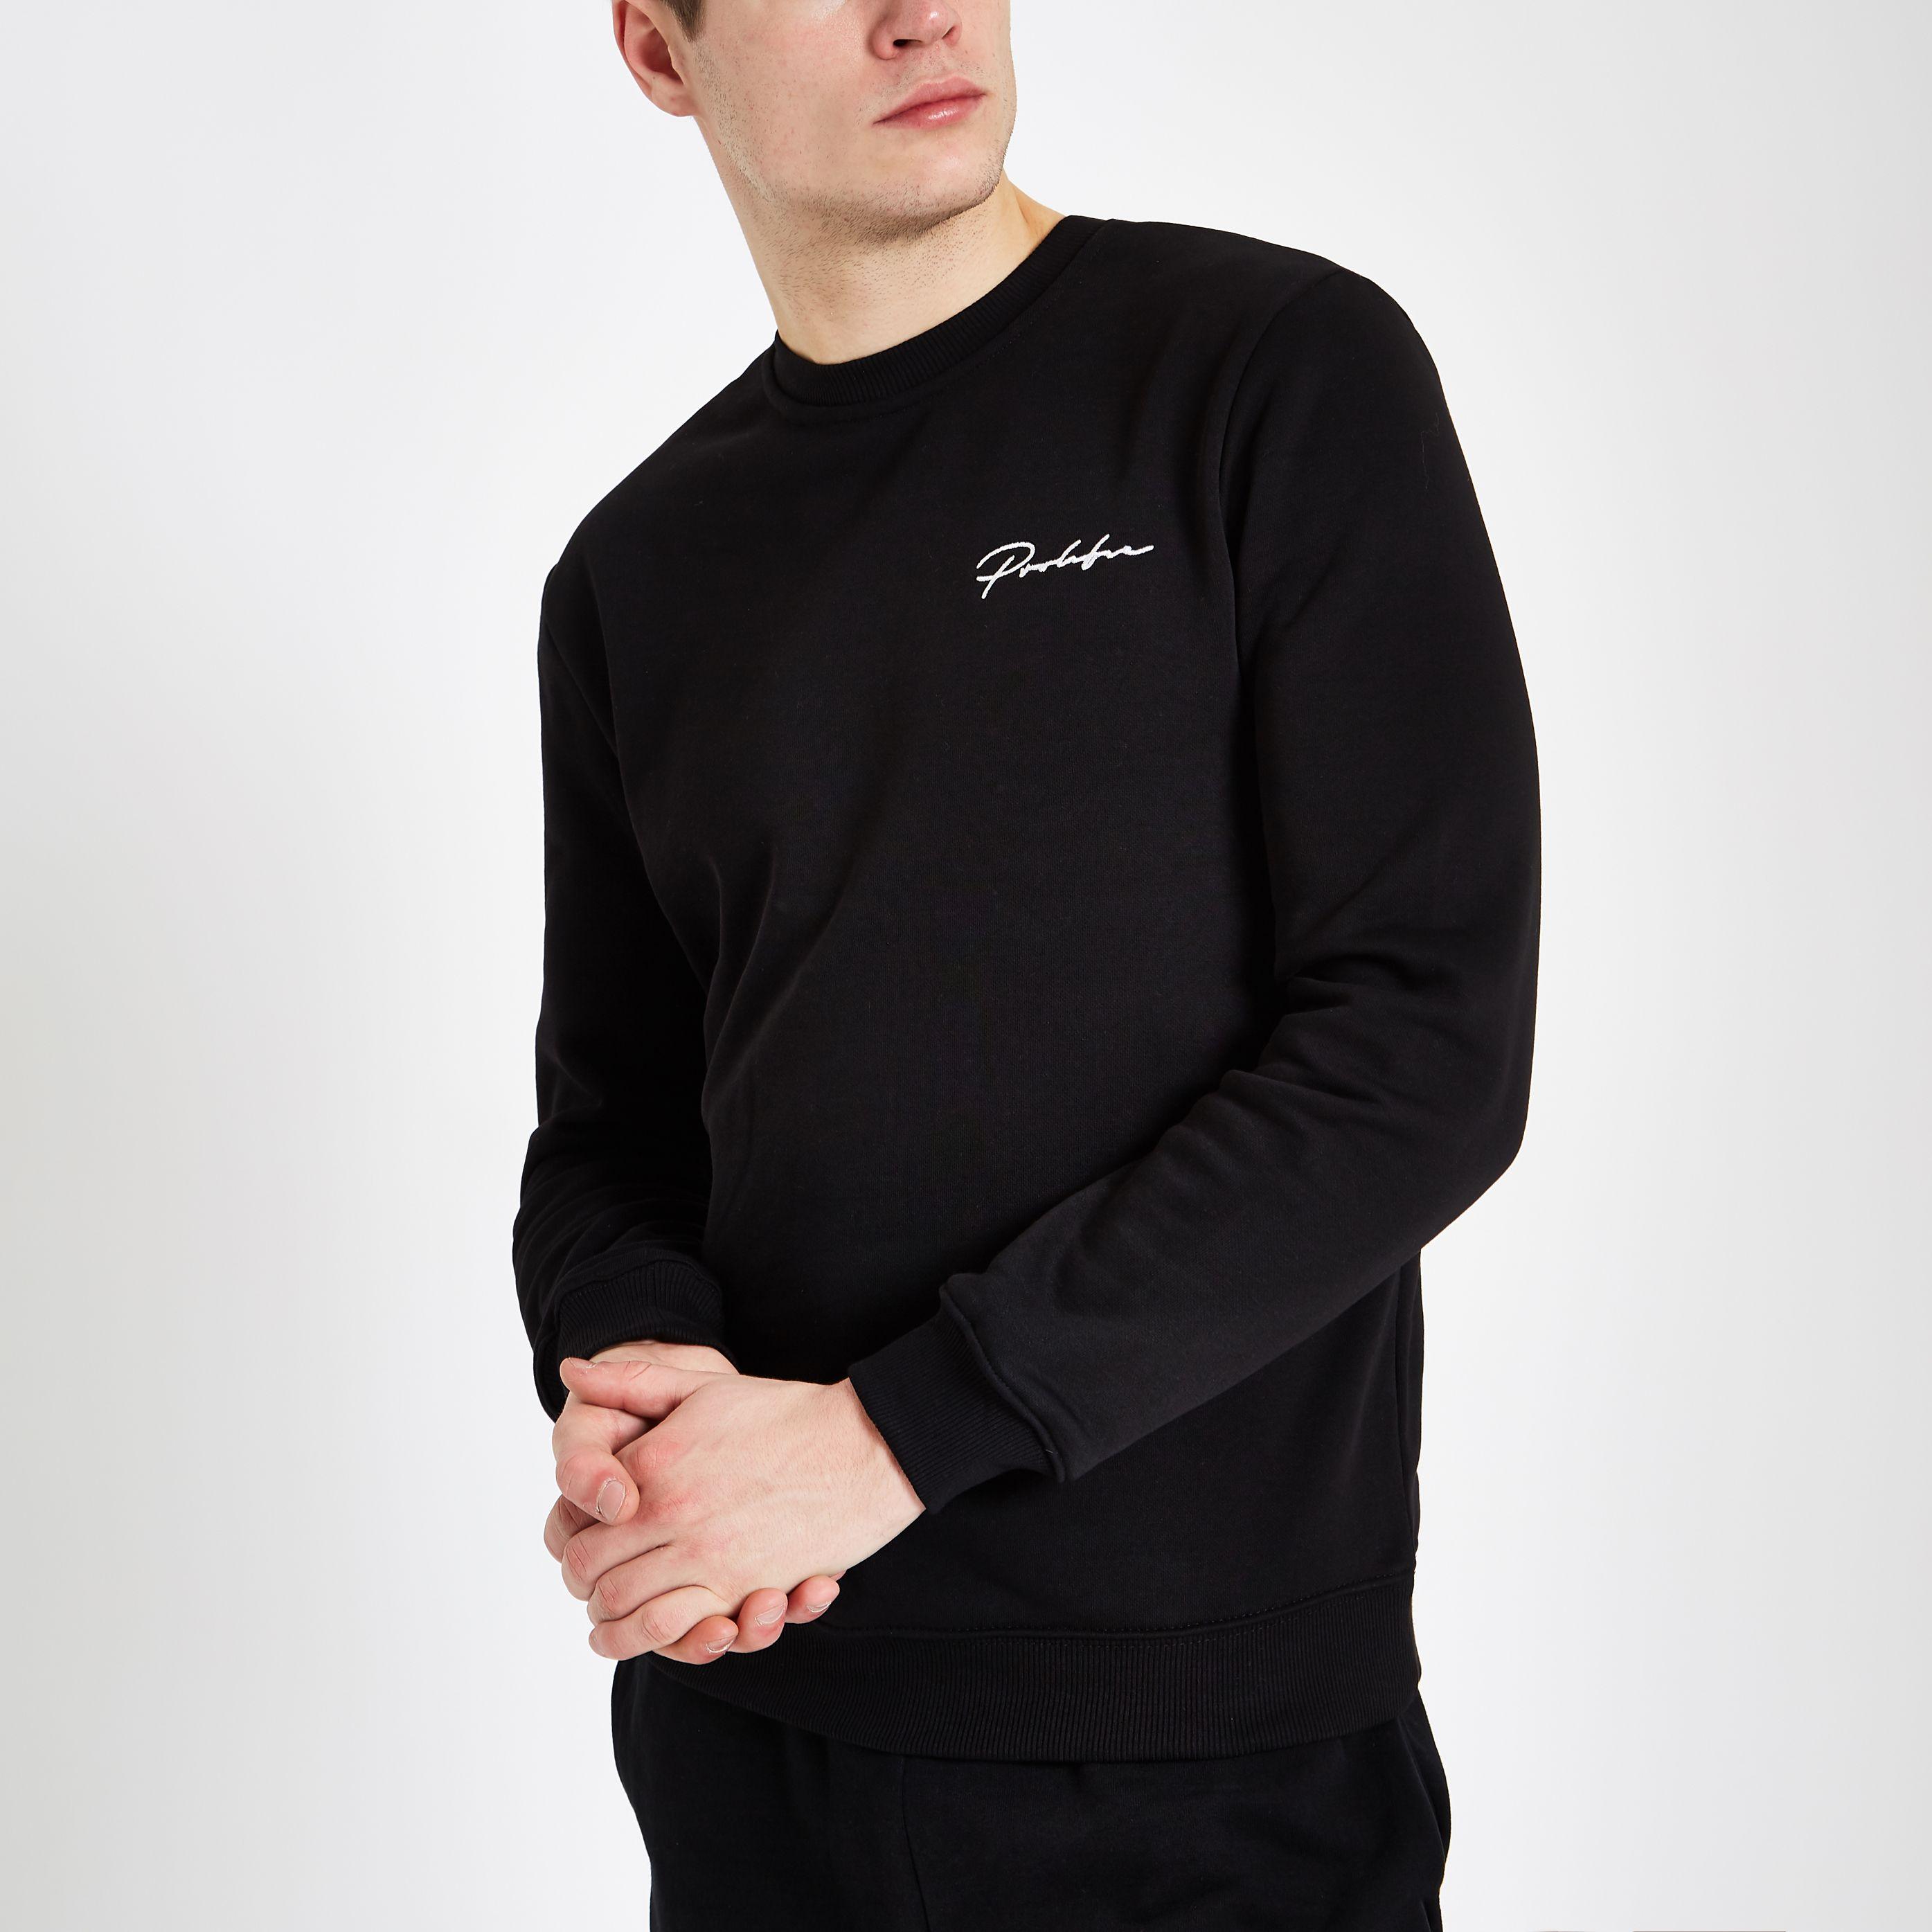 4038e0c08 Mens Black 'Prolific' slim fit sweatshirt | Products in 2019 ...